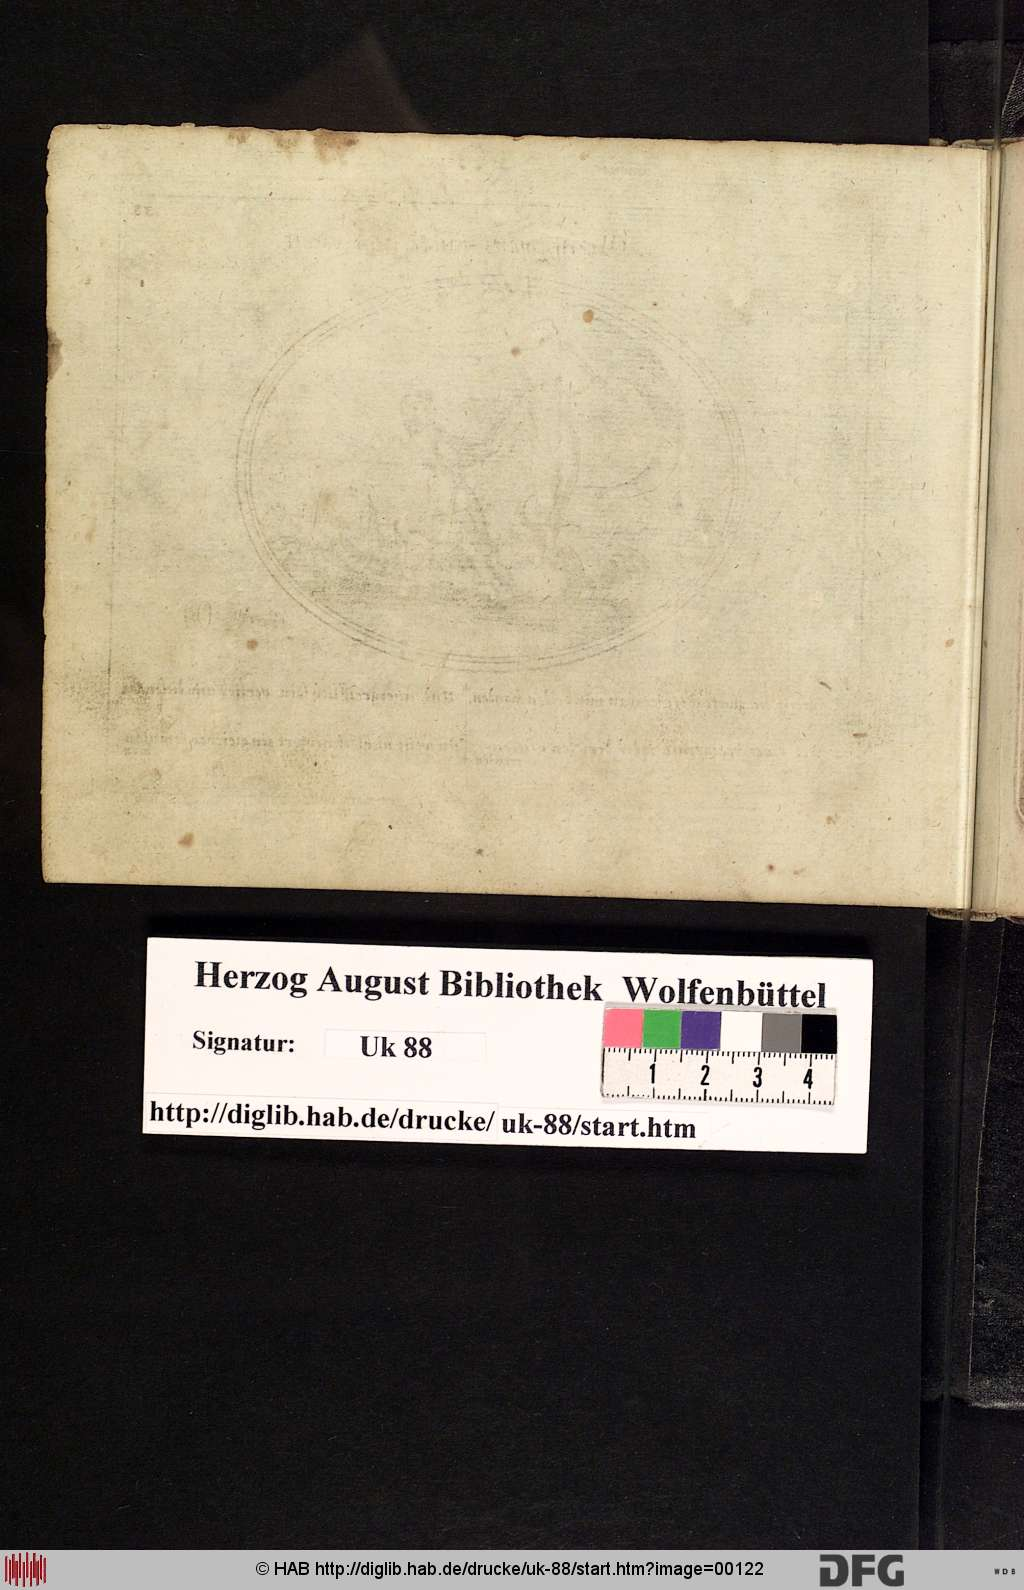 http://diglib.hab.de/drucke/uk-88/00122.jpg